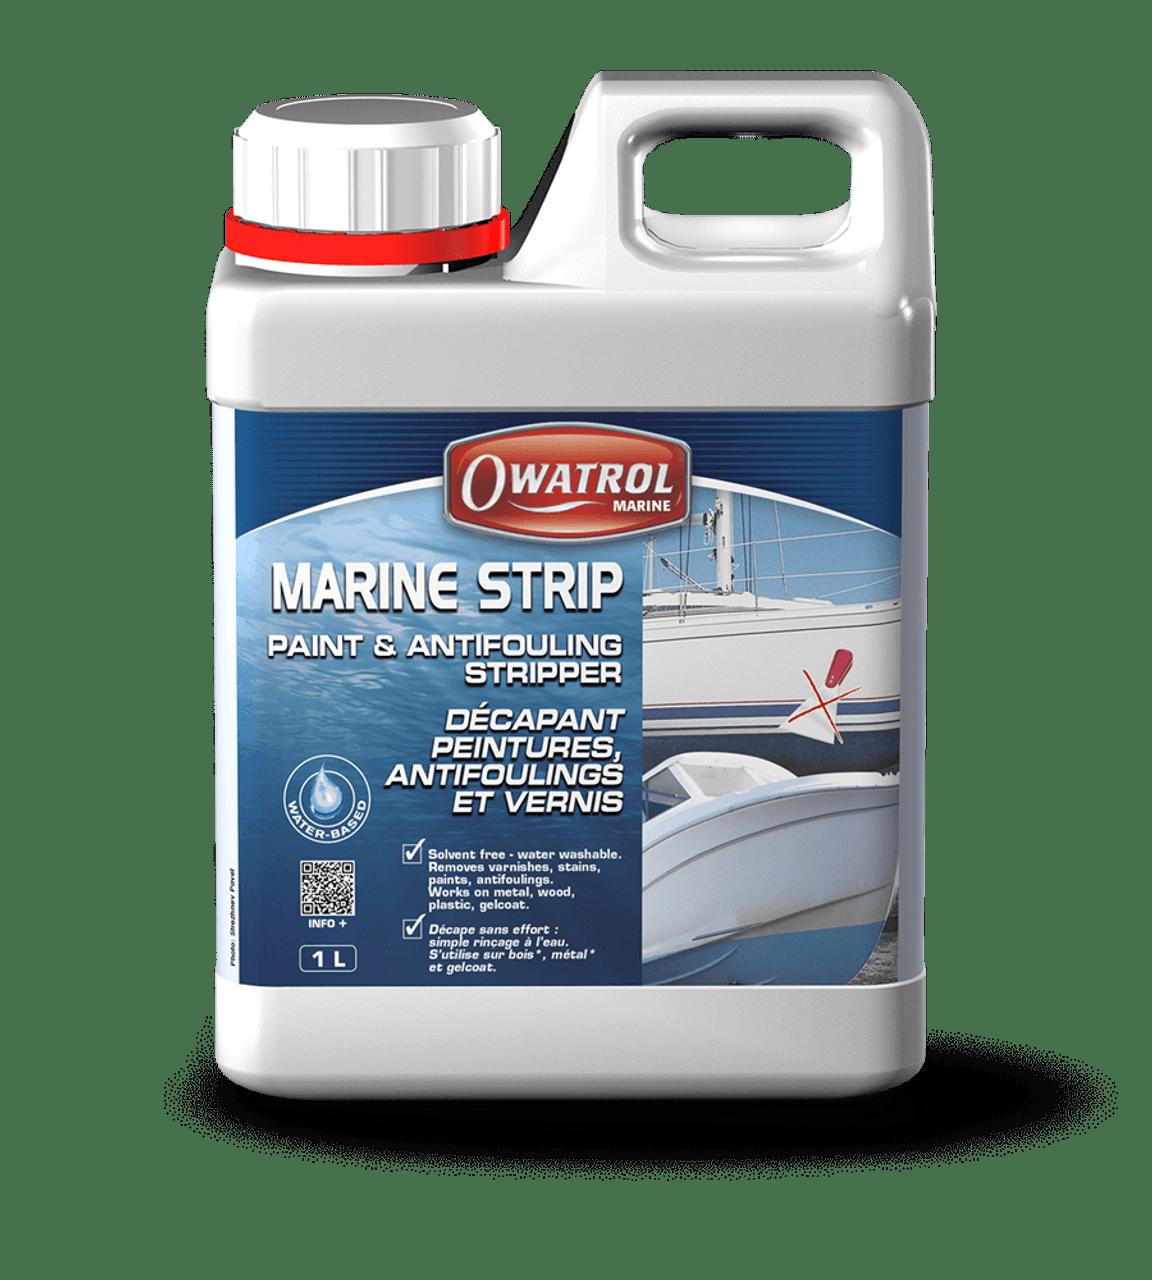 Owatrol Marine Strip Paint & Antifouling Stripper 1L